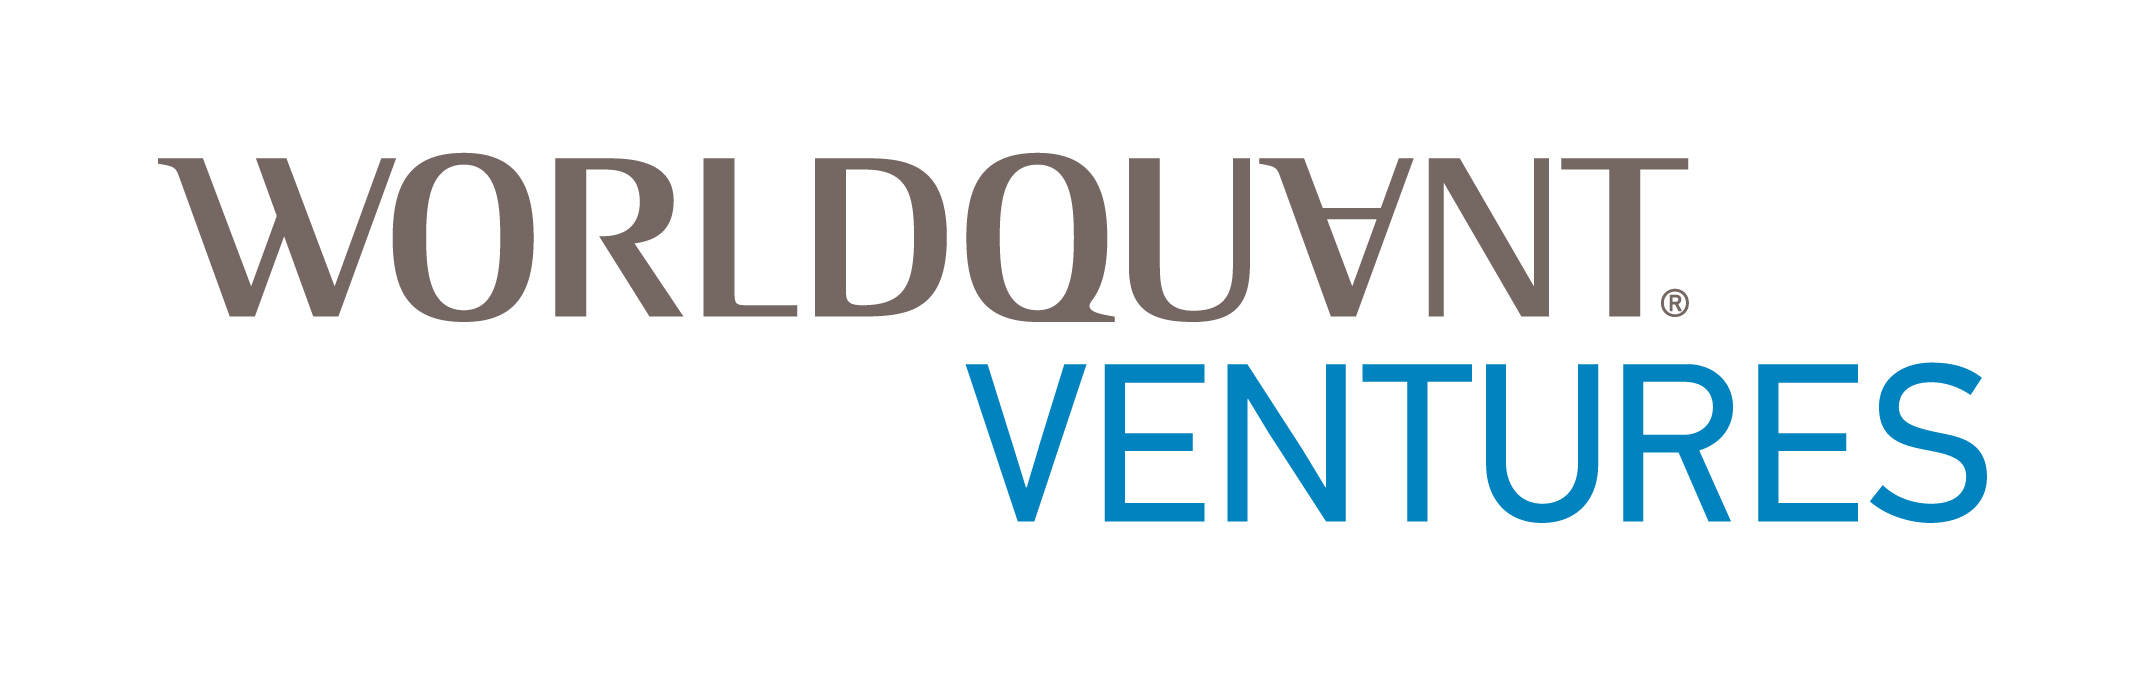 WQVentures logo.jpg